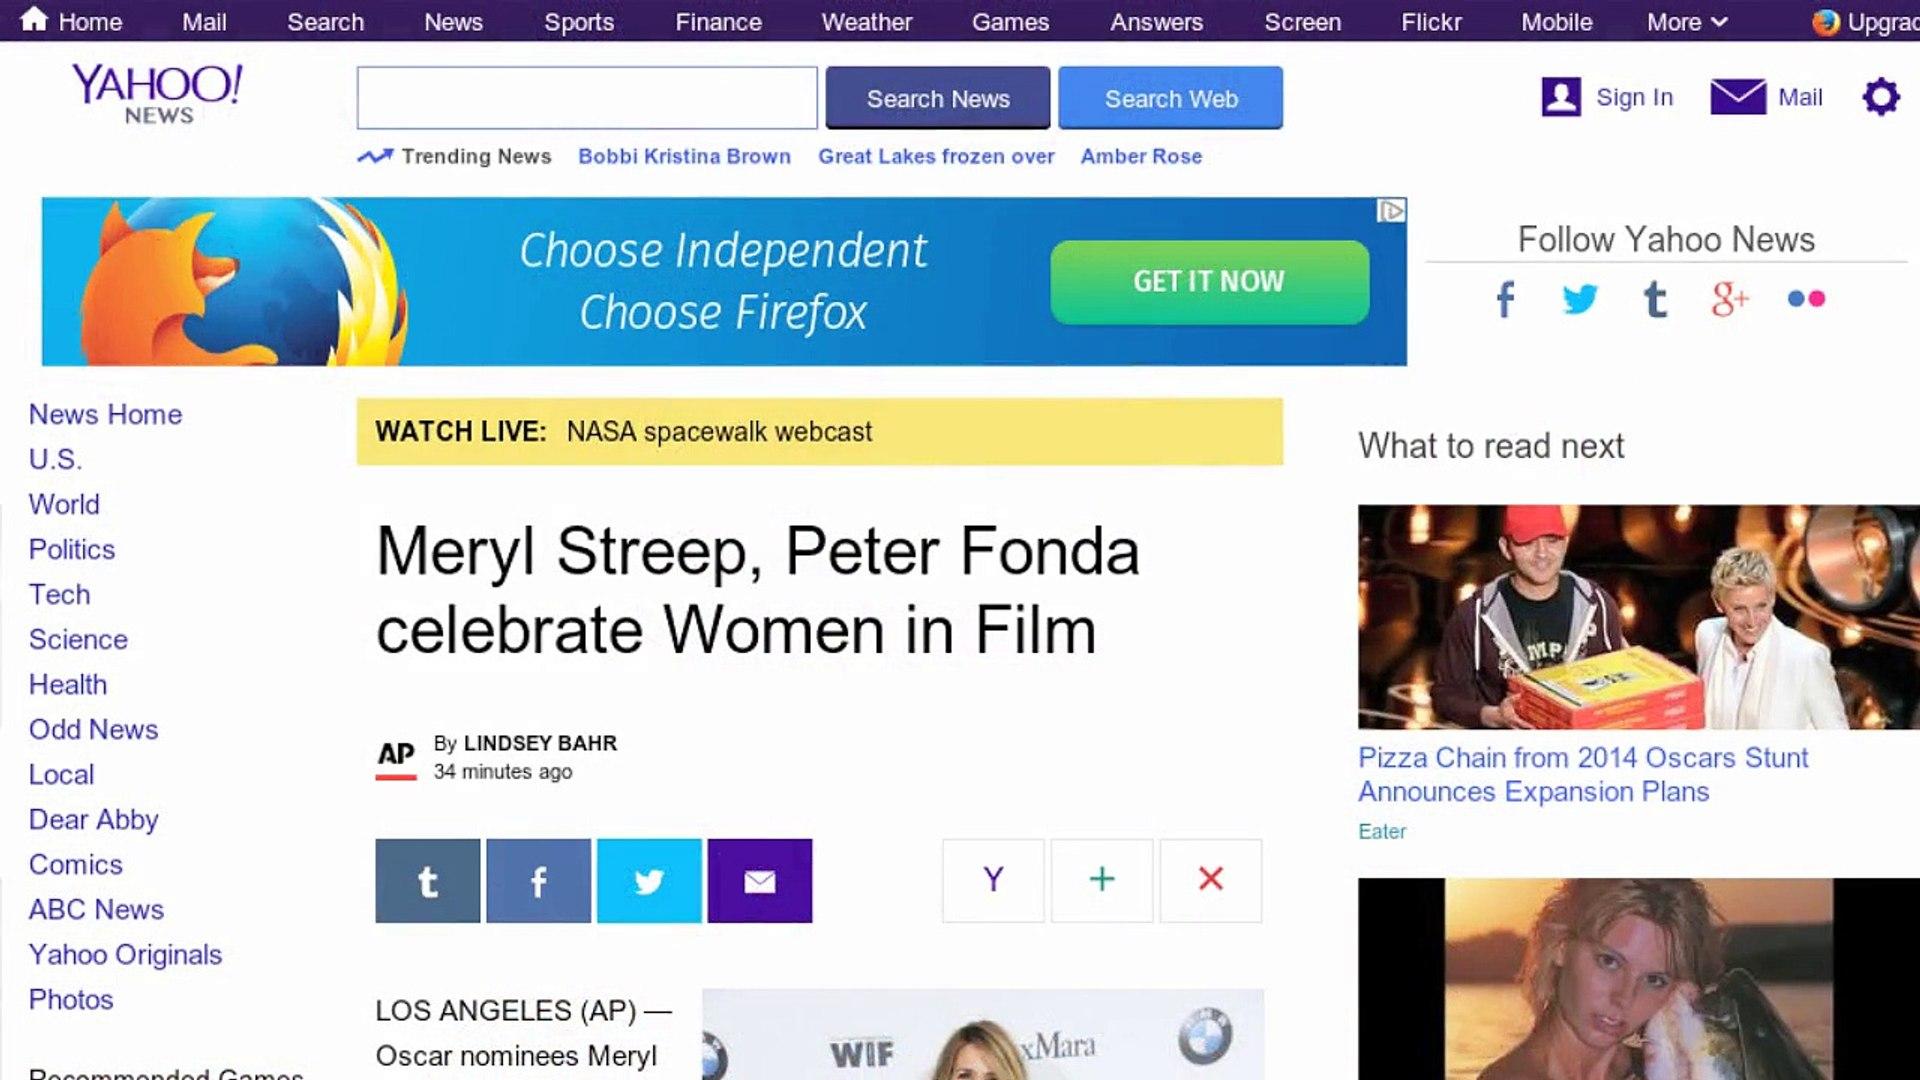 Meryl Streep, Peter Fonda Celebrate Women in Film